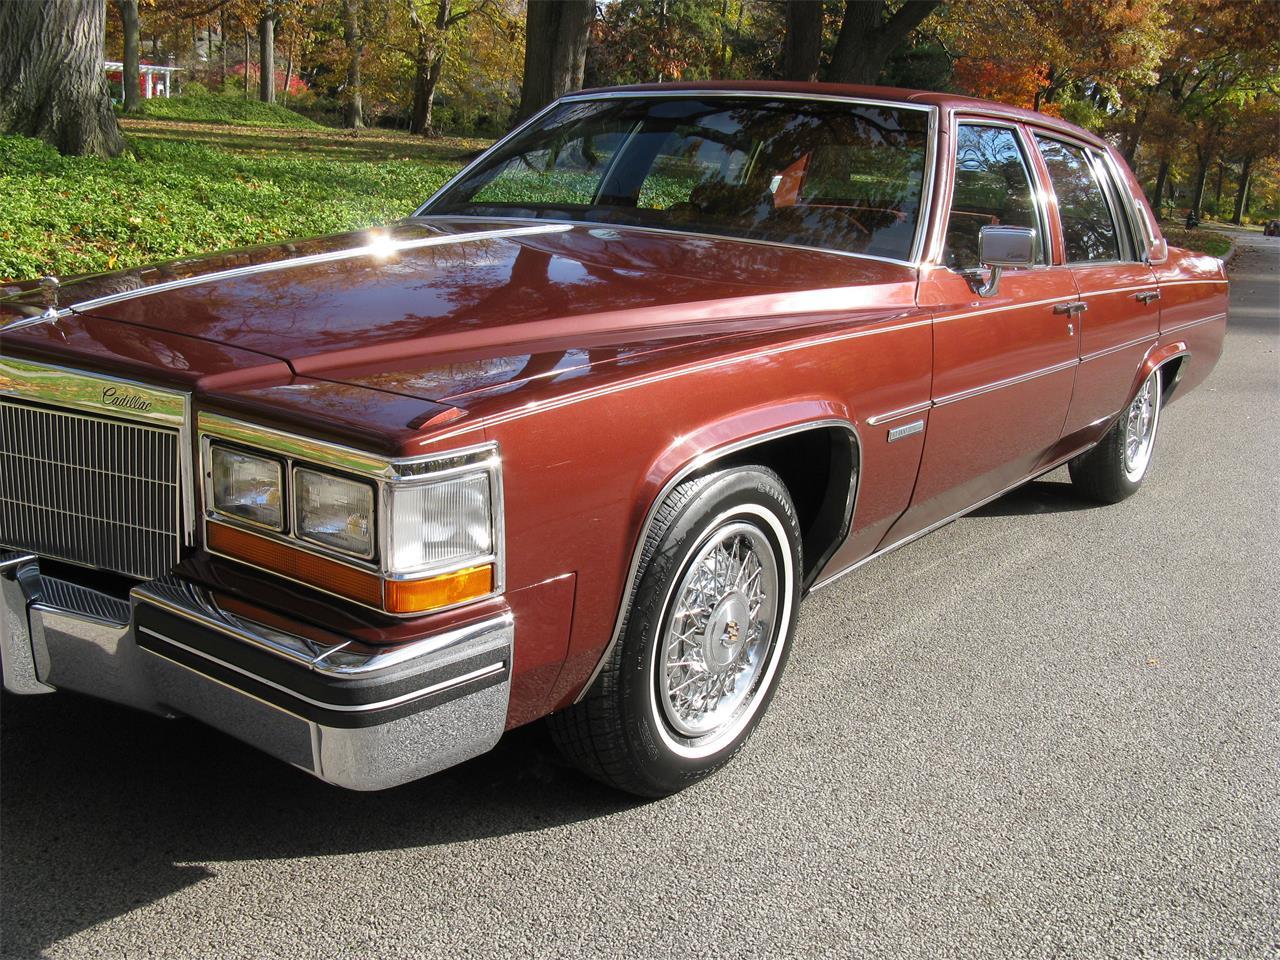 1982 Cadillac Sedan DeVille for Sale | ClassicCars.com ...